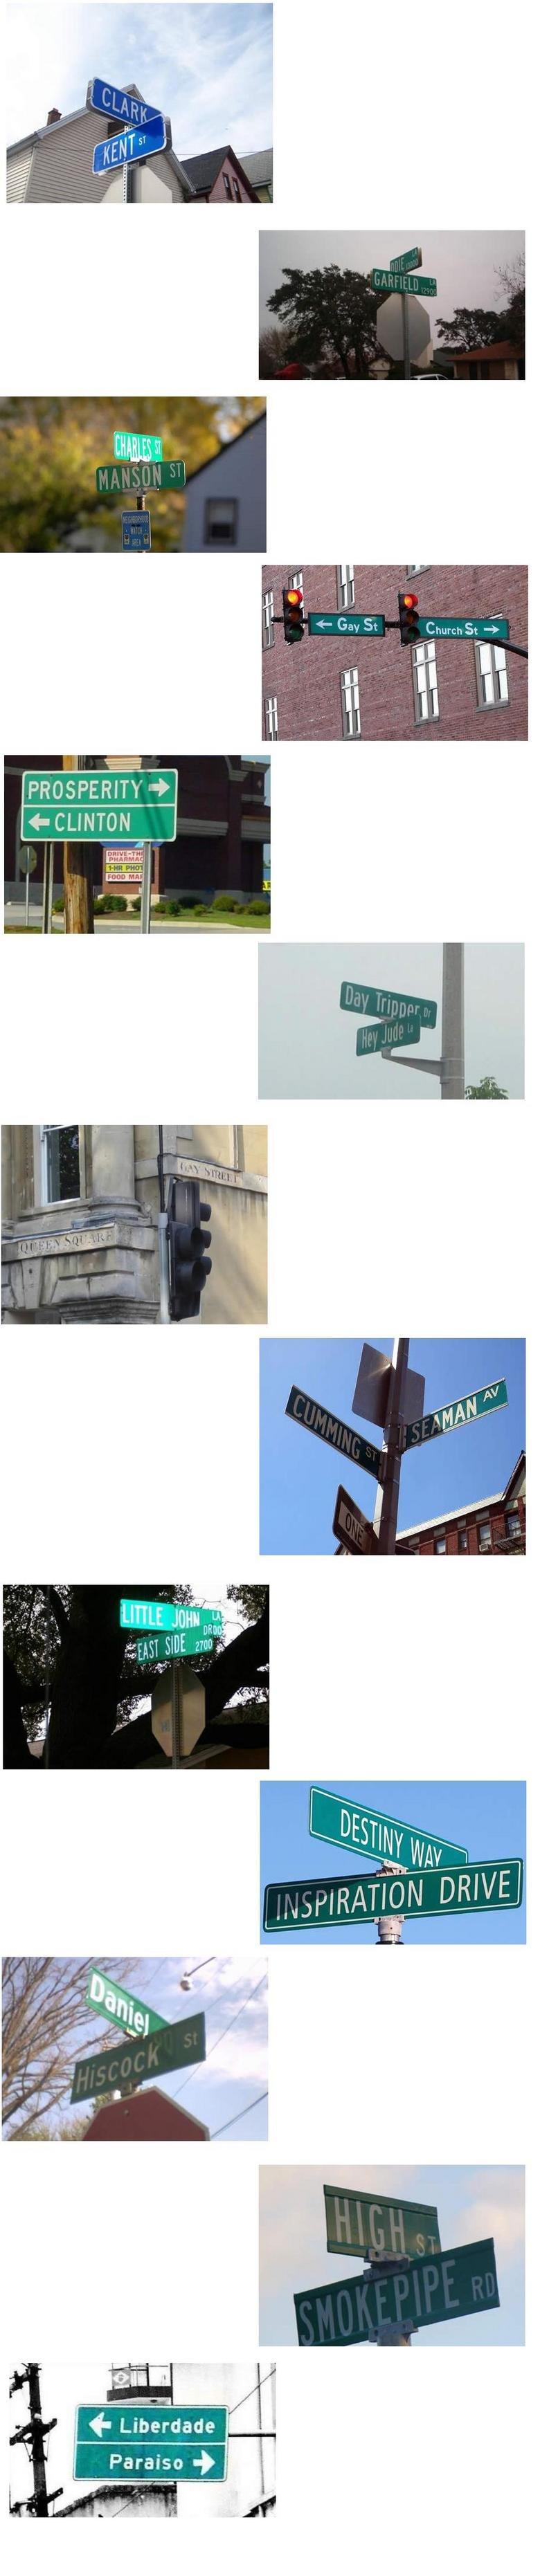 Street names. green if you like. cheek out my other stuff too.. lol seamen cumming street names